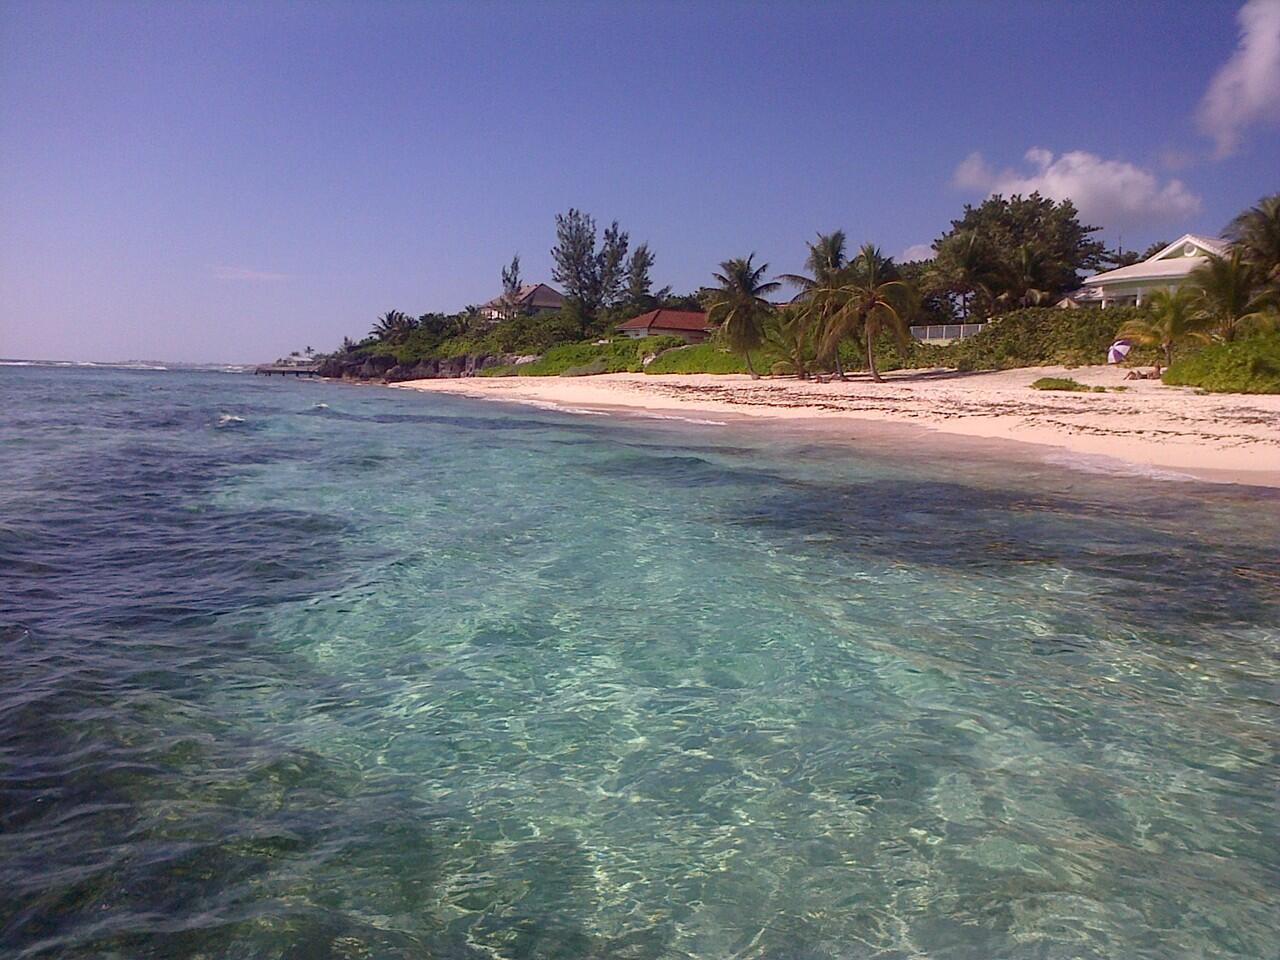 Menengok keindahan Cayman Islands (Kepulauan Cayman), negeri tanpa 'pajak' di Karibia